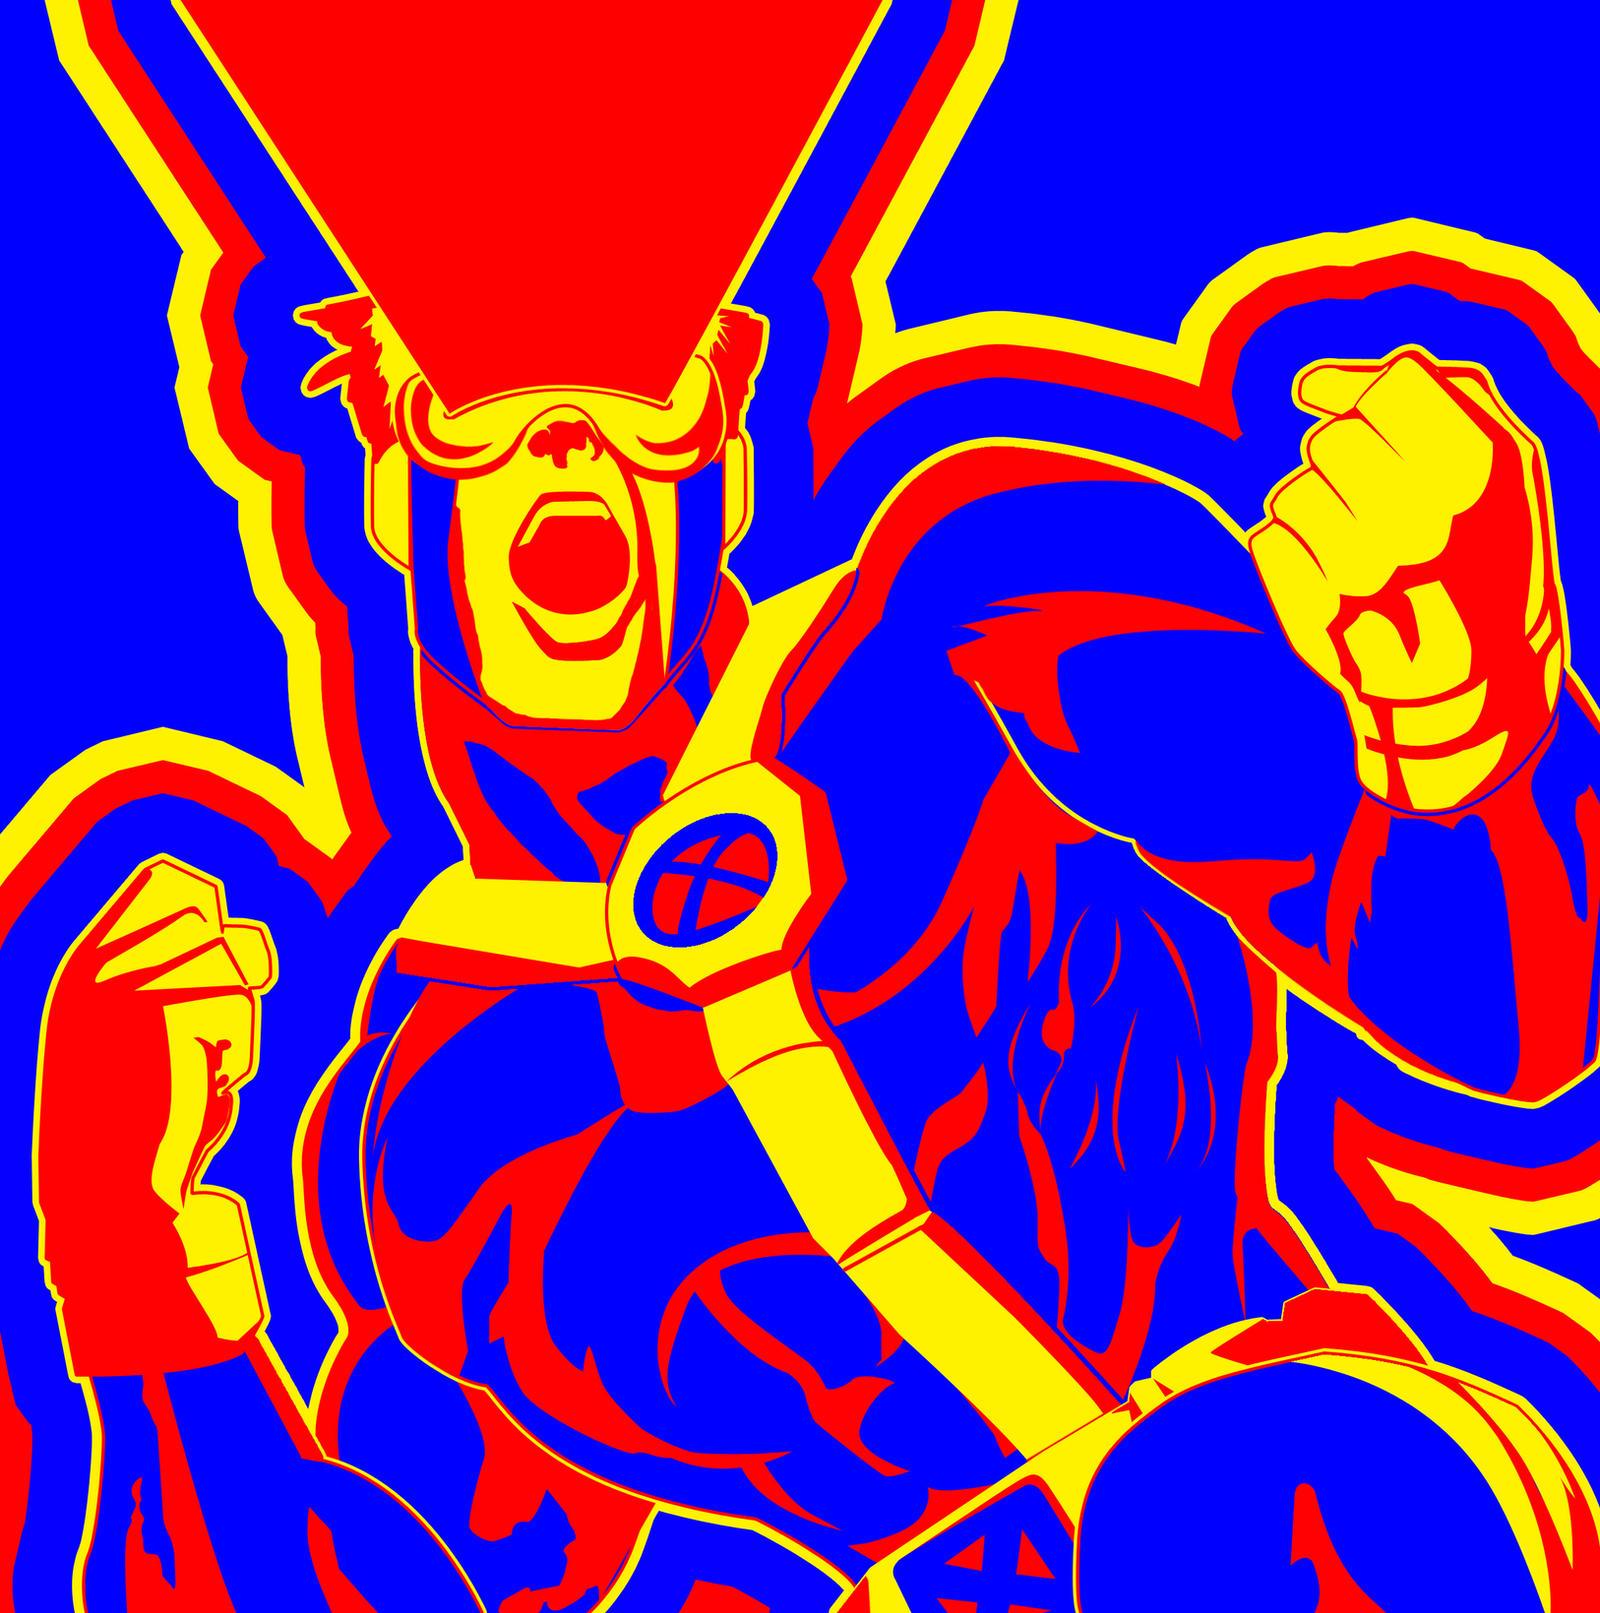 Pix For Gt Tetradic Color Scheme Art